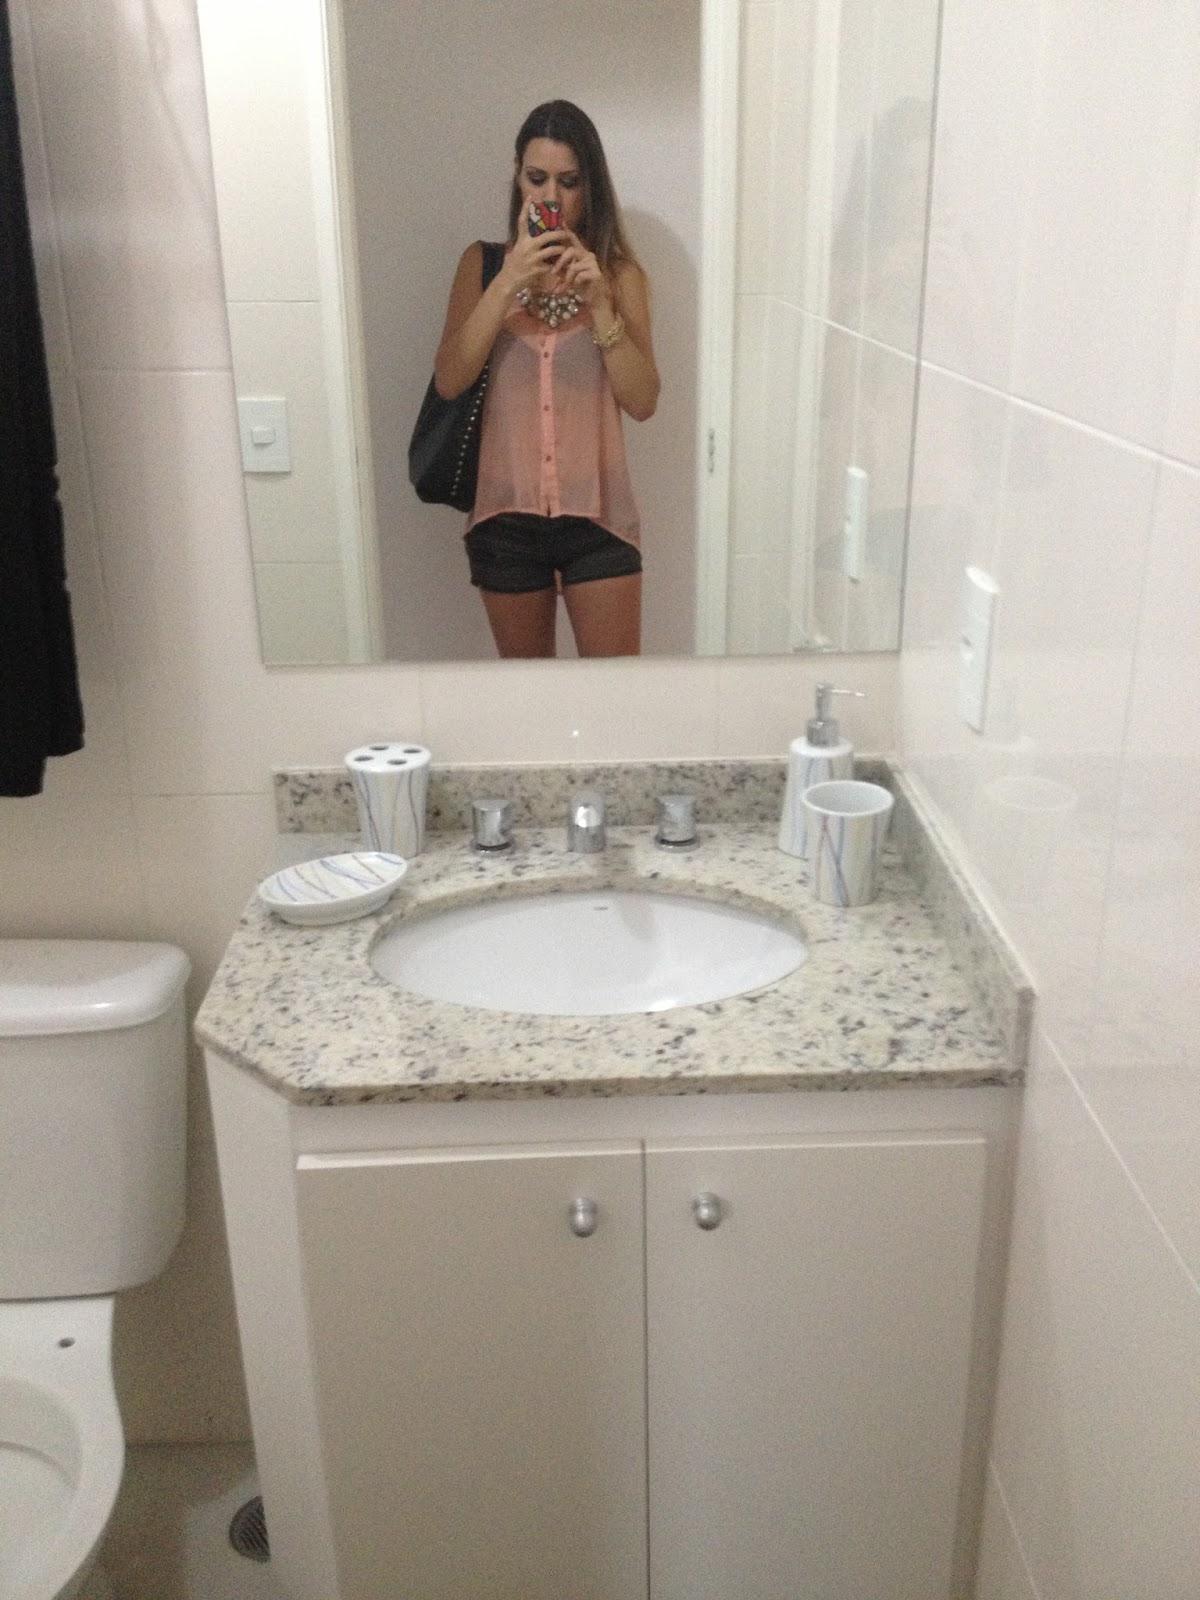 Banheiro da sala! A mesma pedra e o gabinete no mesmo estilo tbm  #654B3B 1200 1600